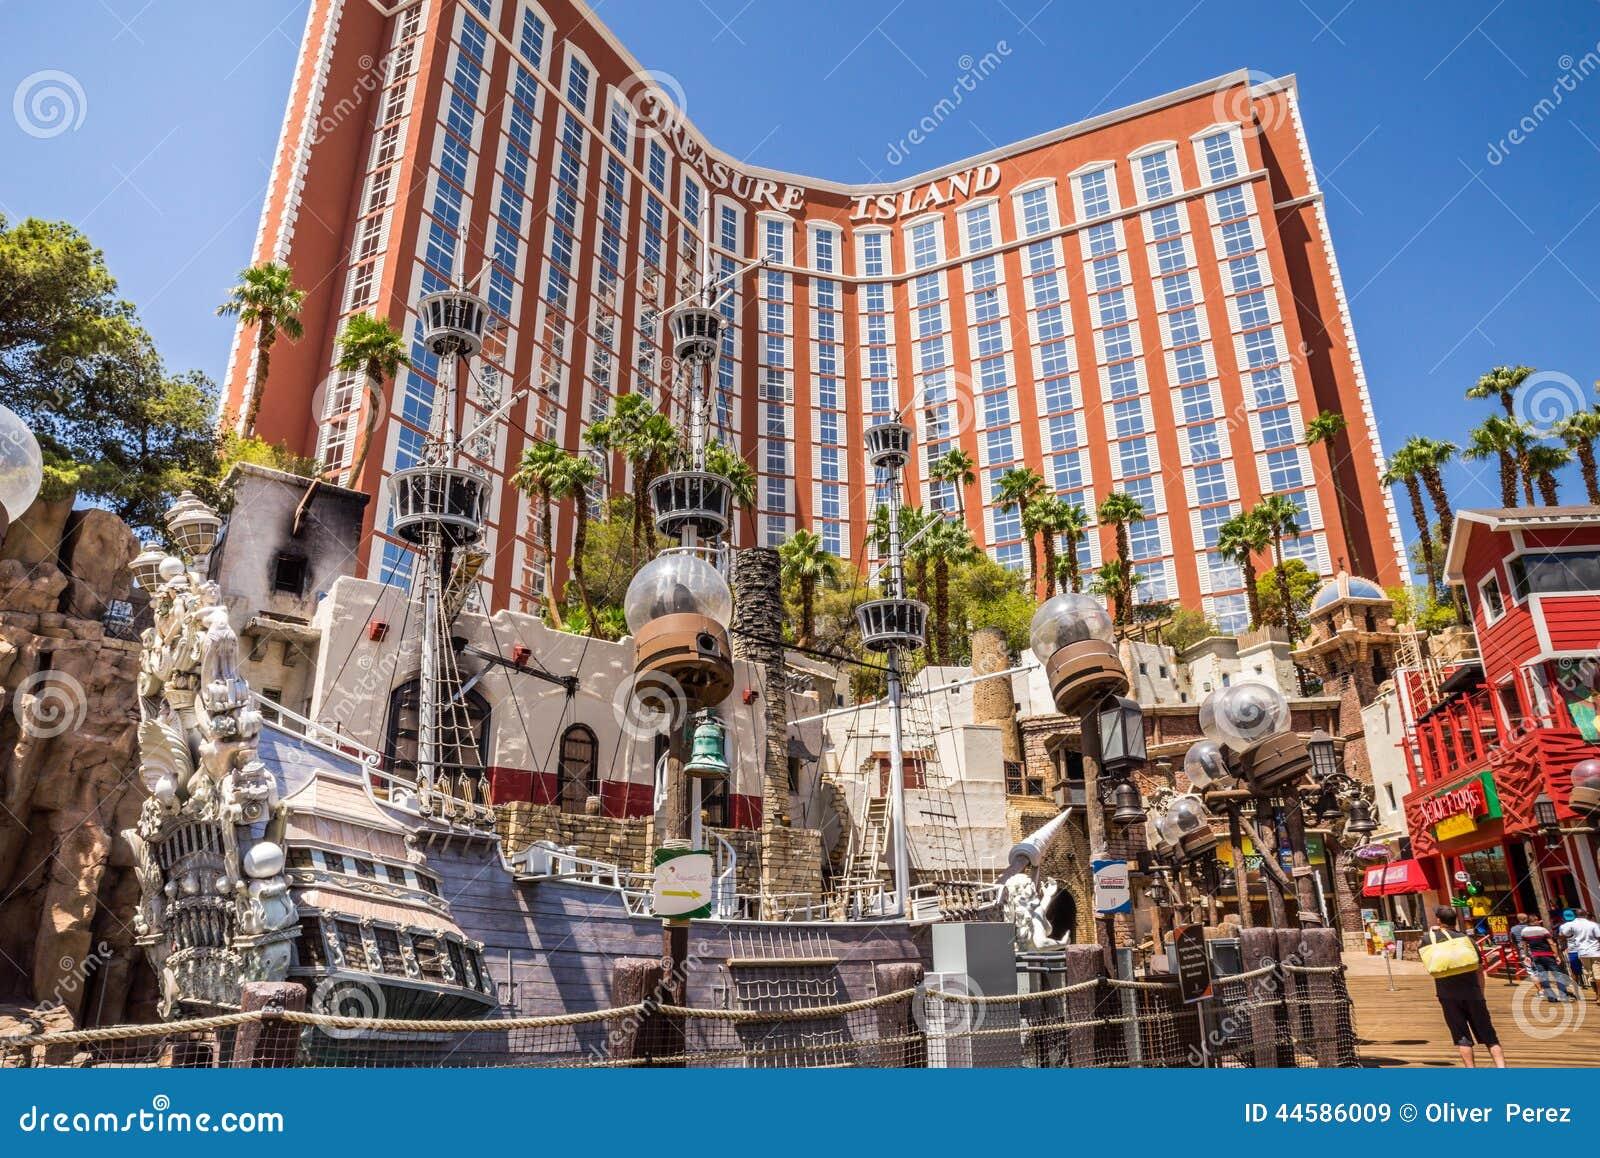 Las Vegas Casino Chips